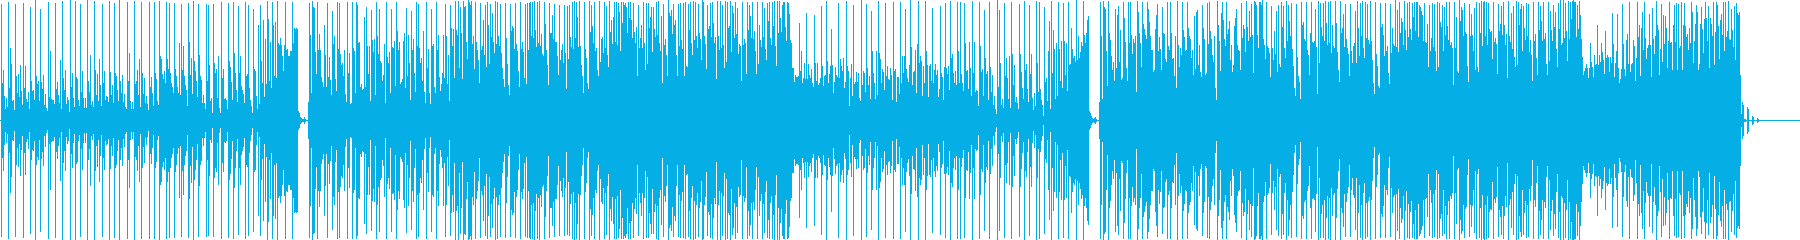 EDM系落ち着いたシックな曲-6の再生済みの波形